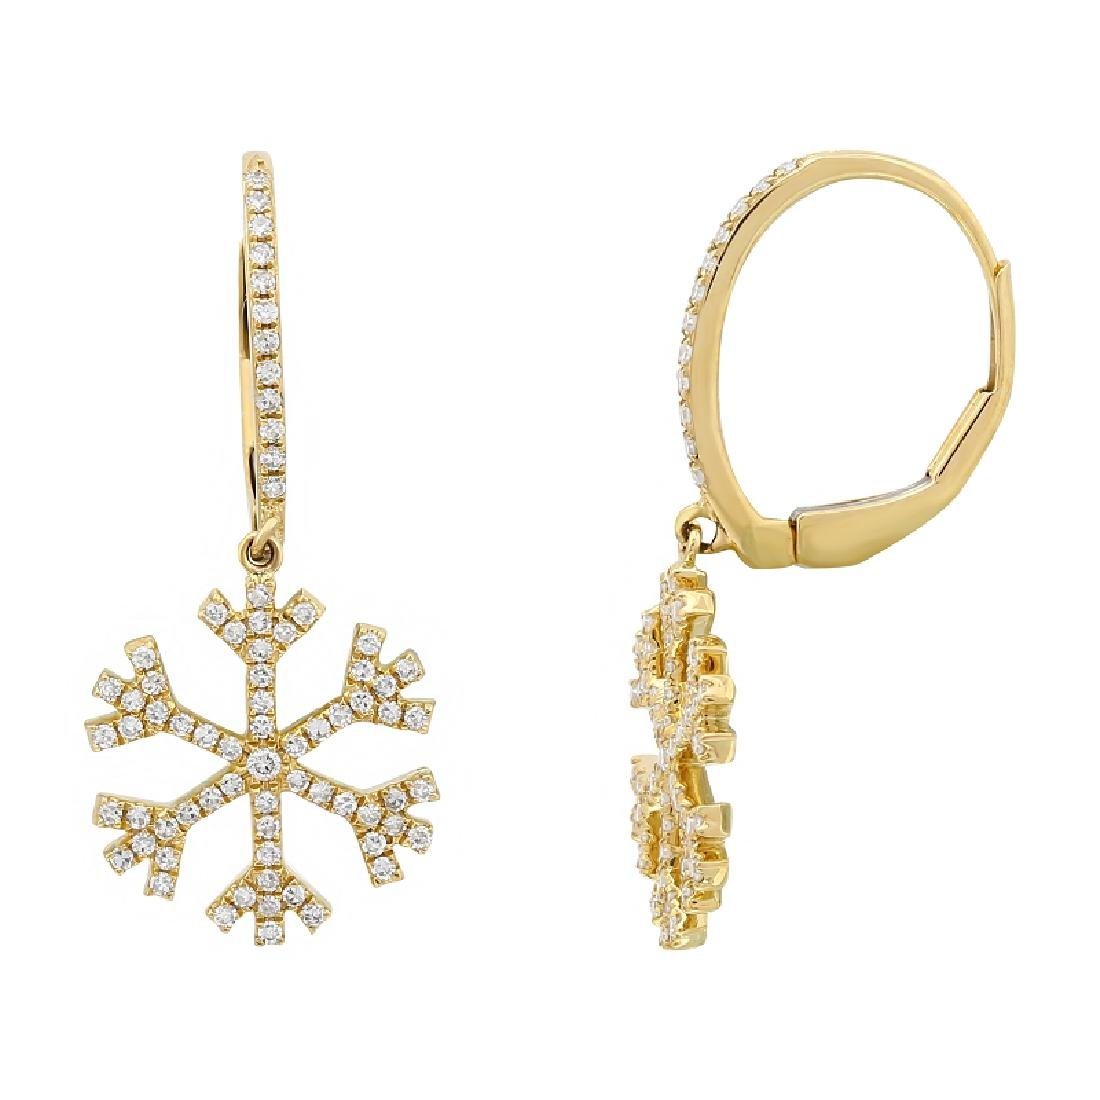 14KT Yellow Gold 0.4ctw Diamond Earrings L7943